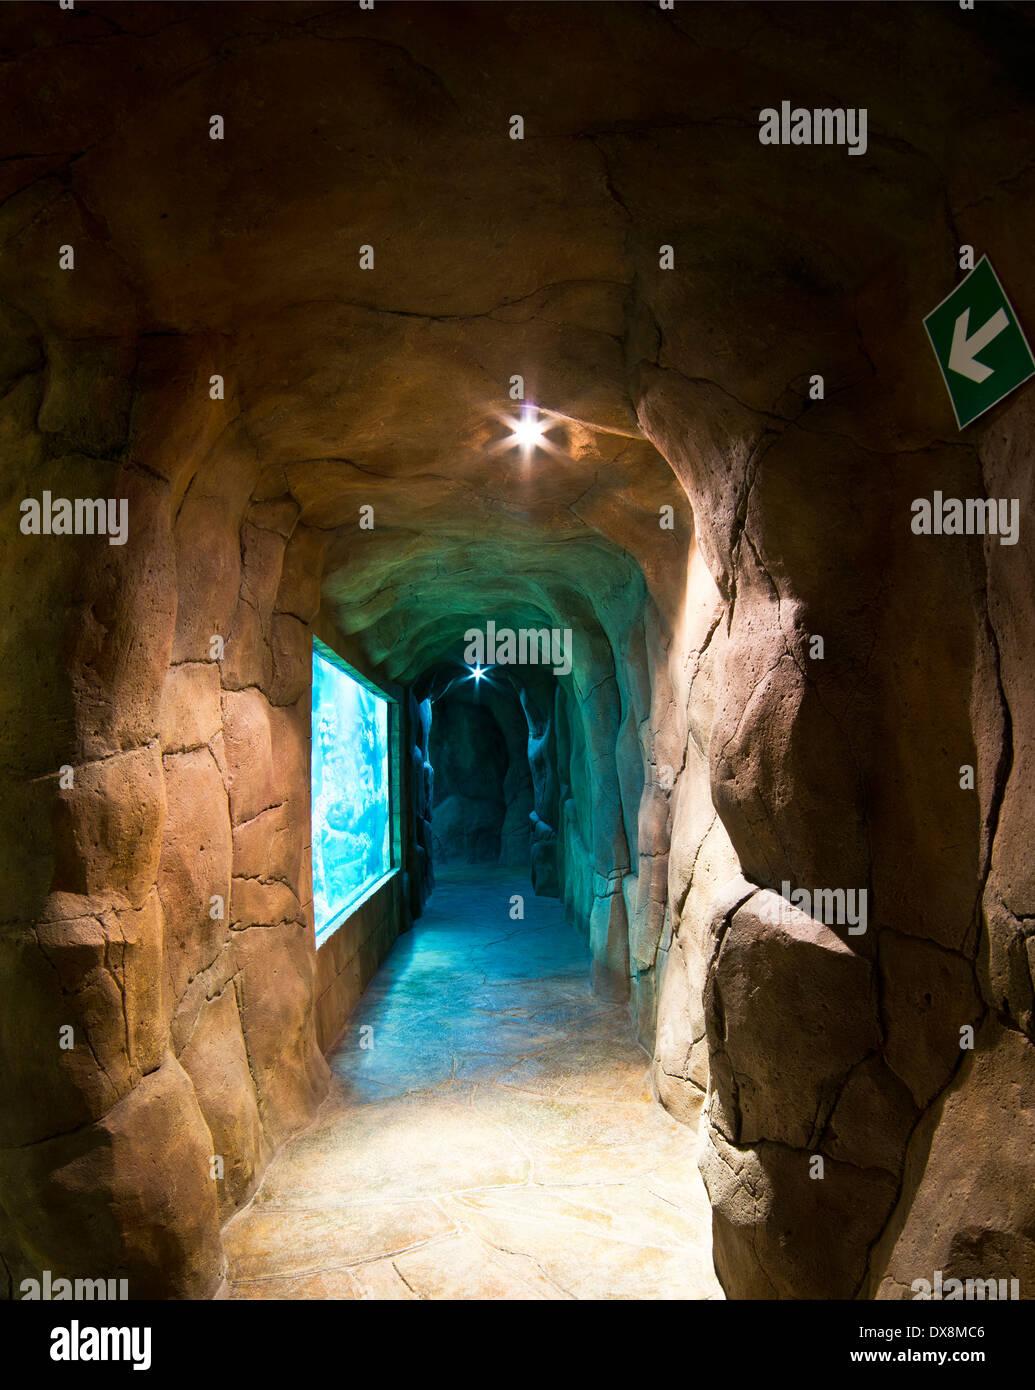 underground interior - Stock Image